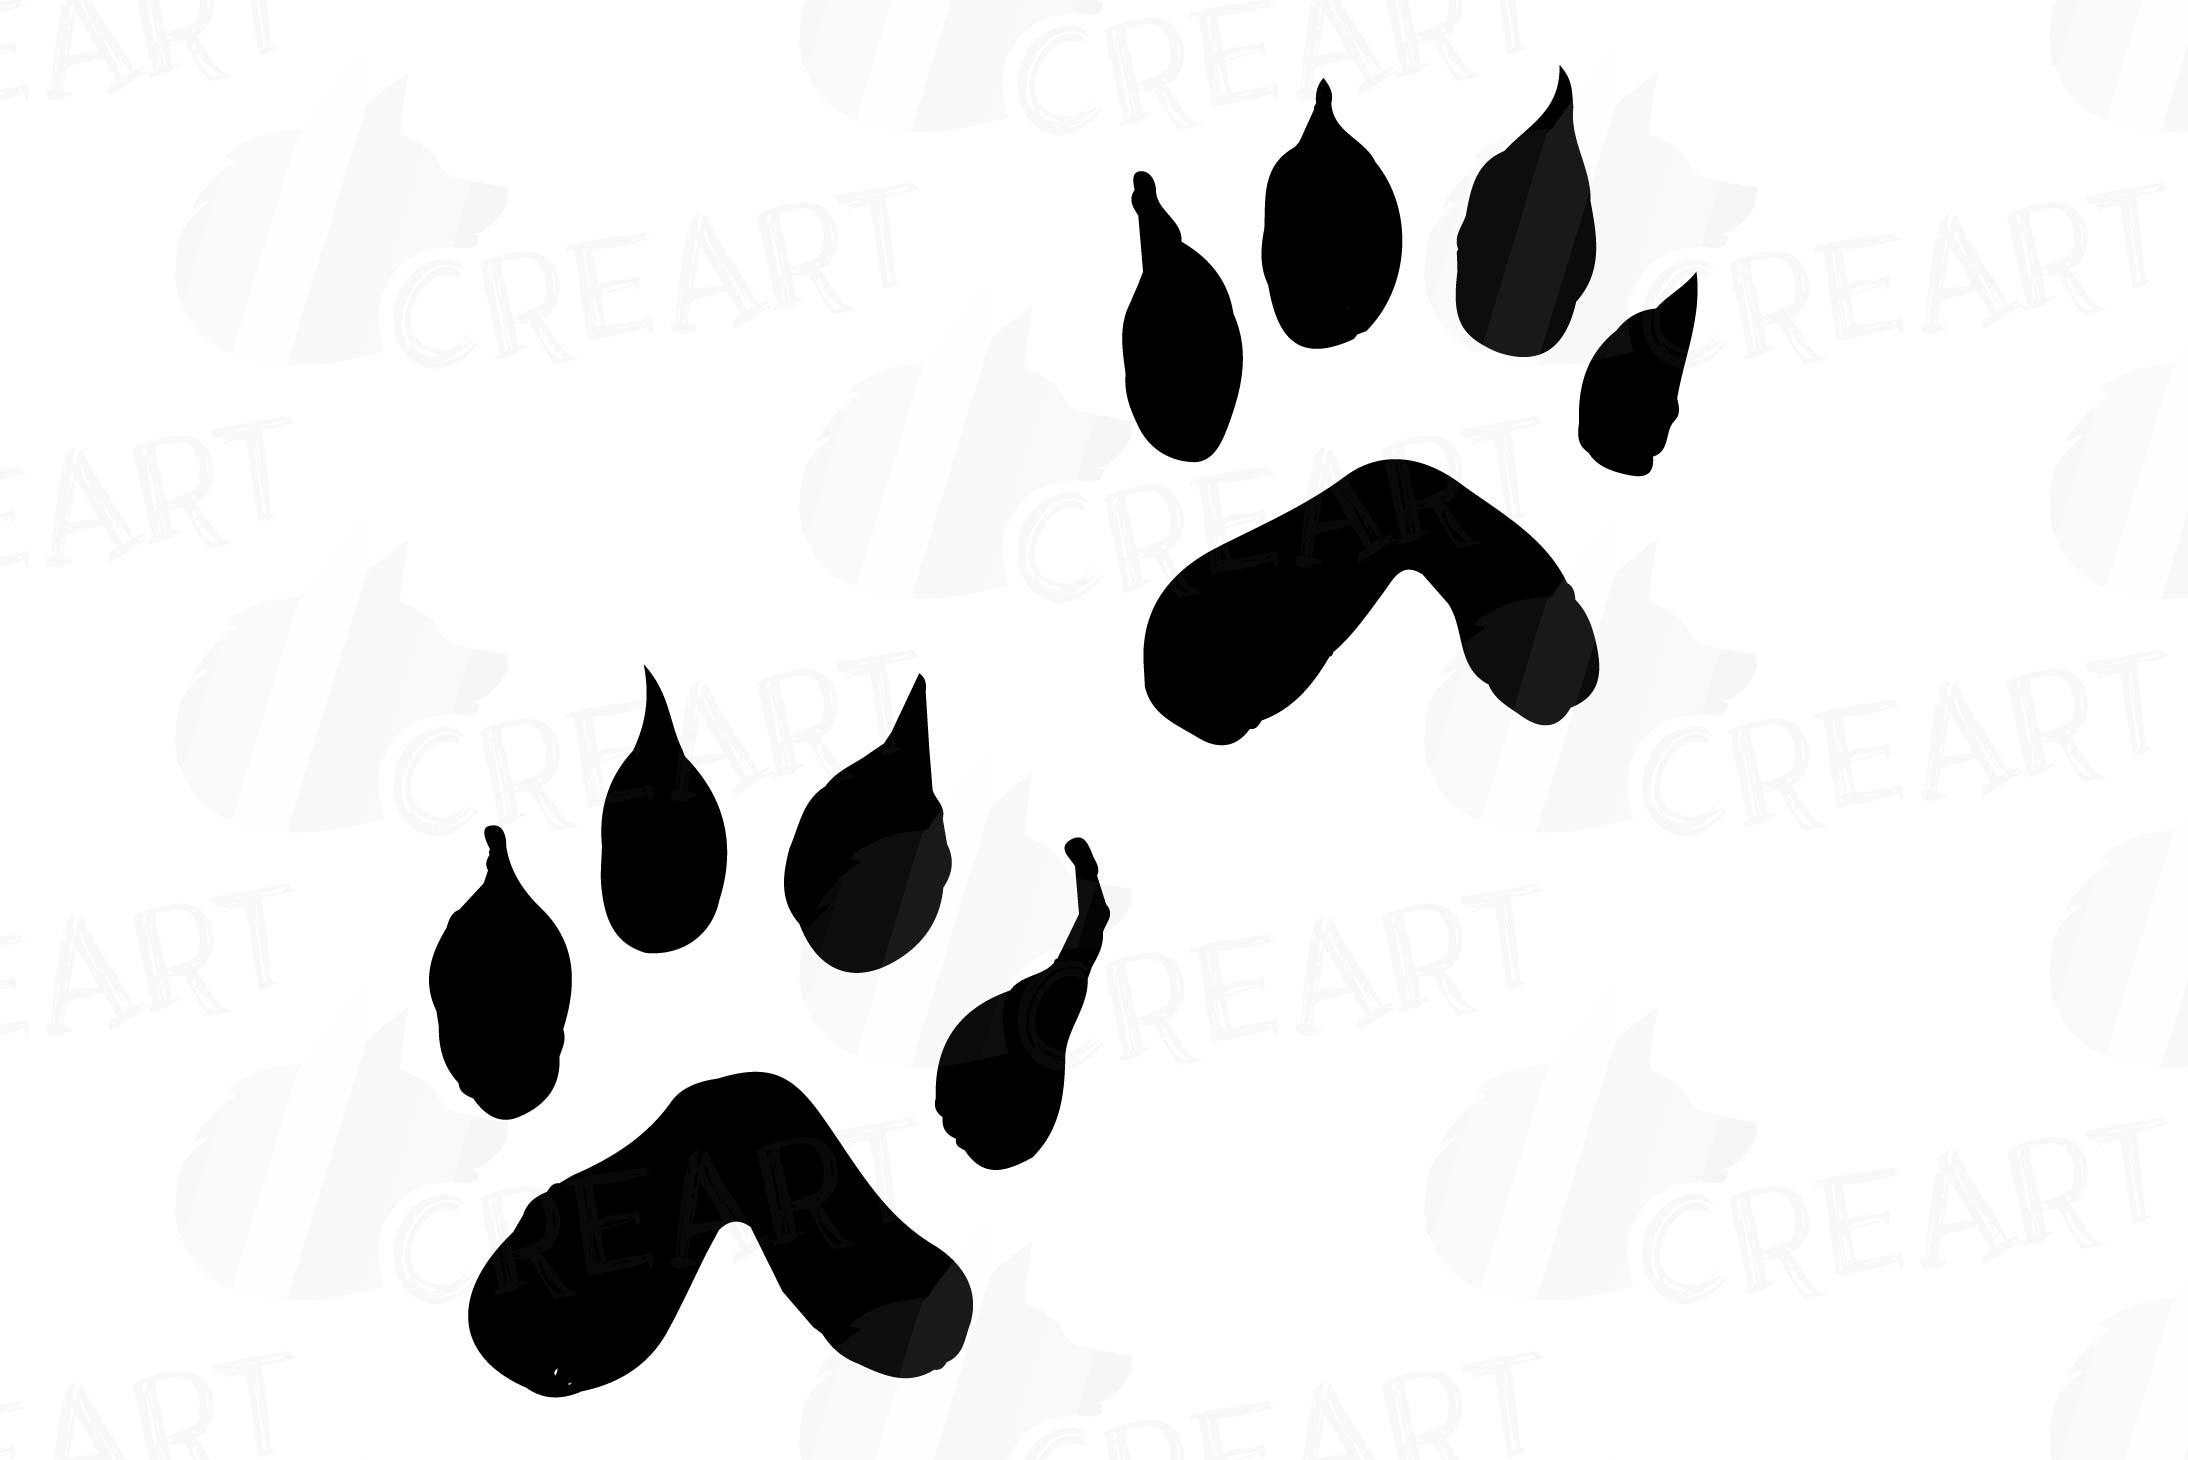 Woodland animal footprint clipart freeuse stock Animal Tracks, Woodland Animals footprints Clipart pack freeuse stock